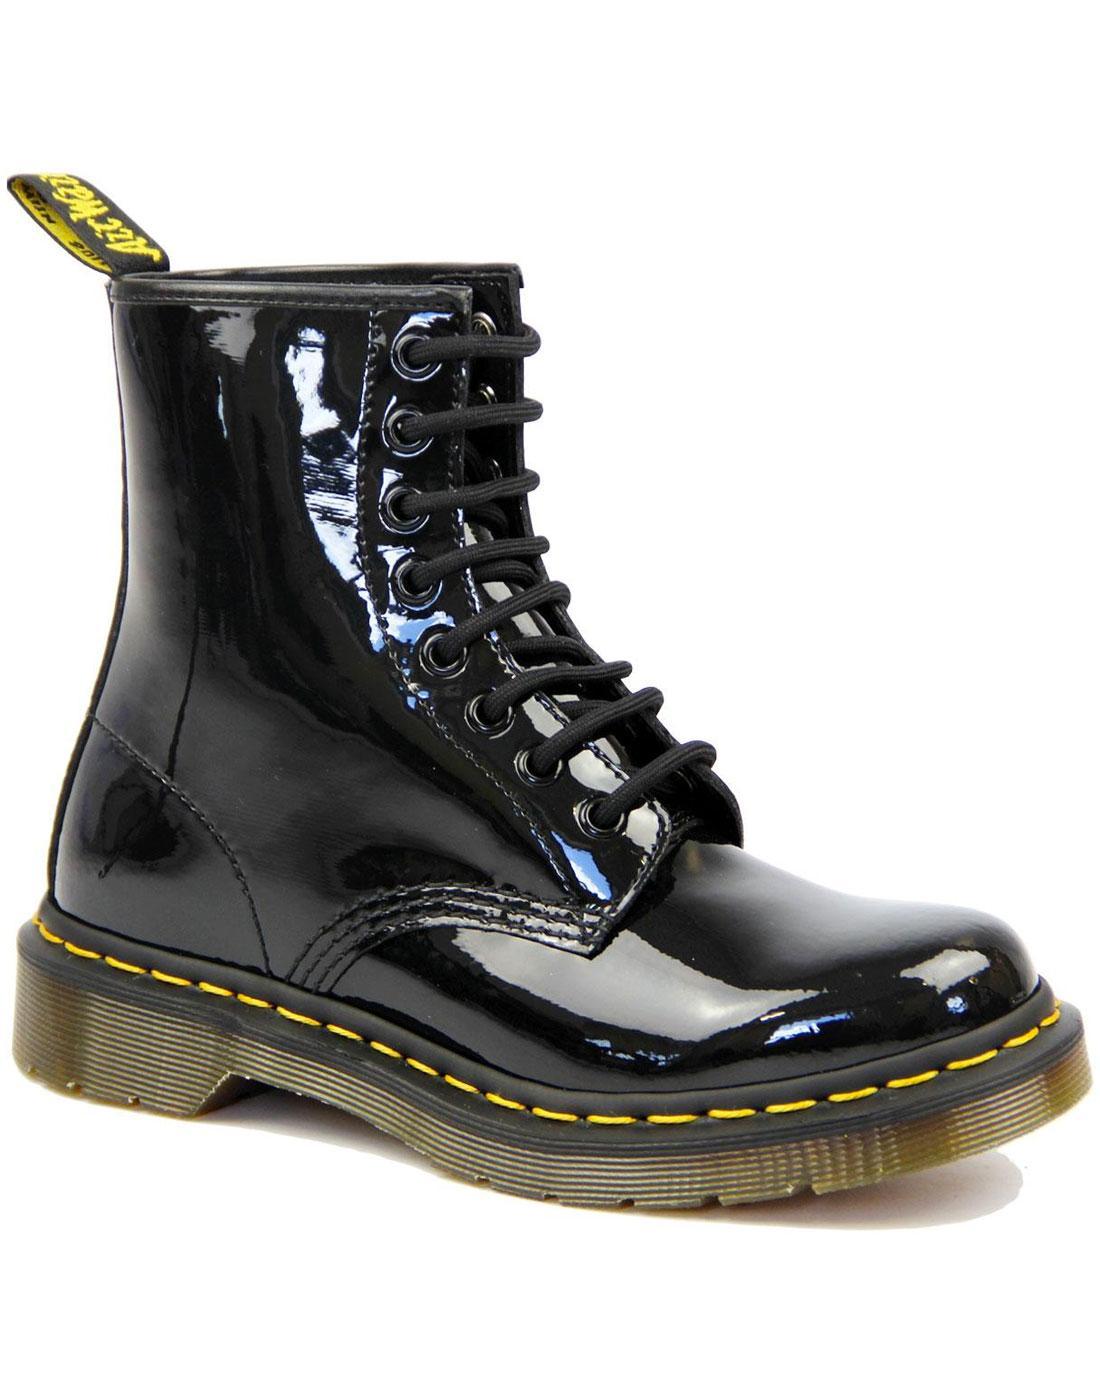 1460 W DR MARTENS Retro Patent Lamper Boots BLACK